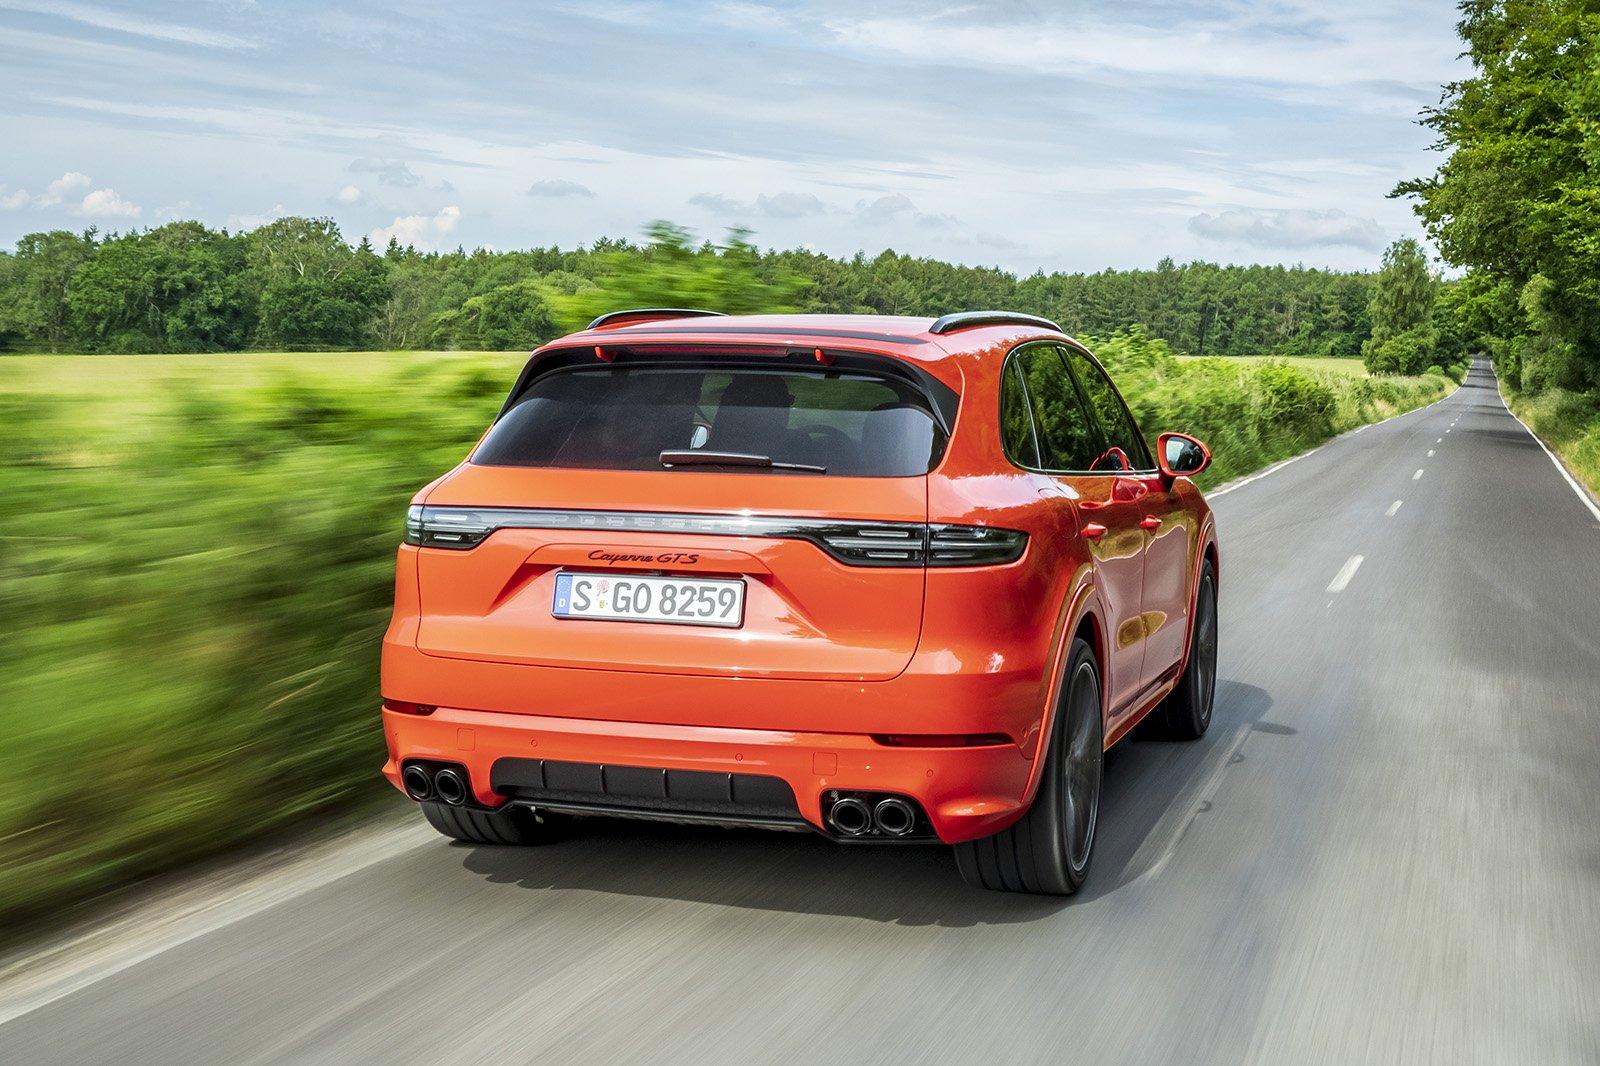 2020 Porsche Cayenne GTS rear 3/4